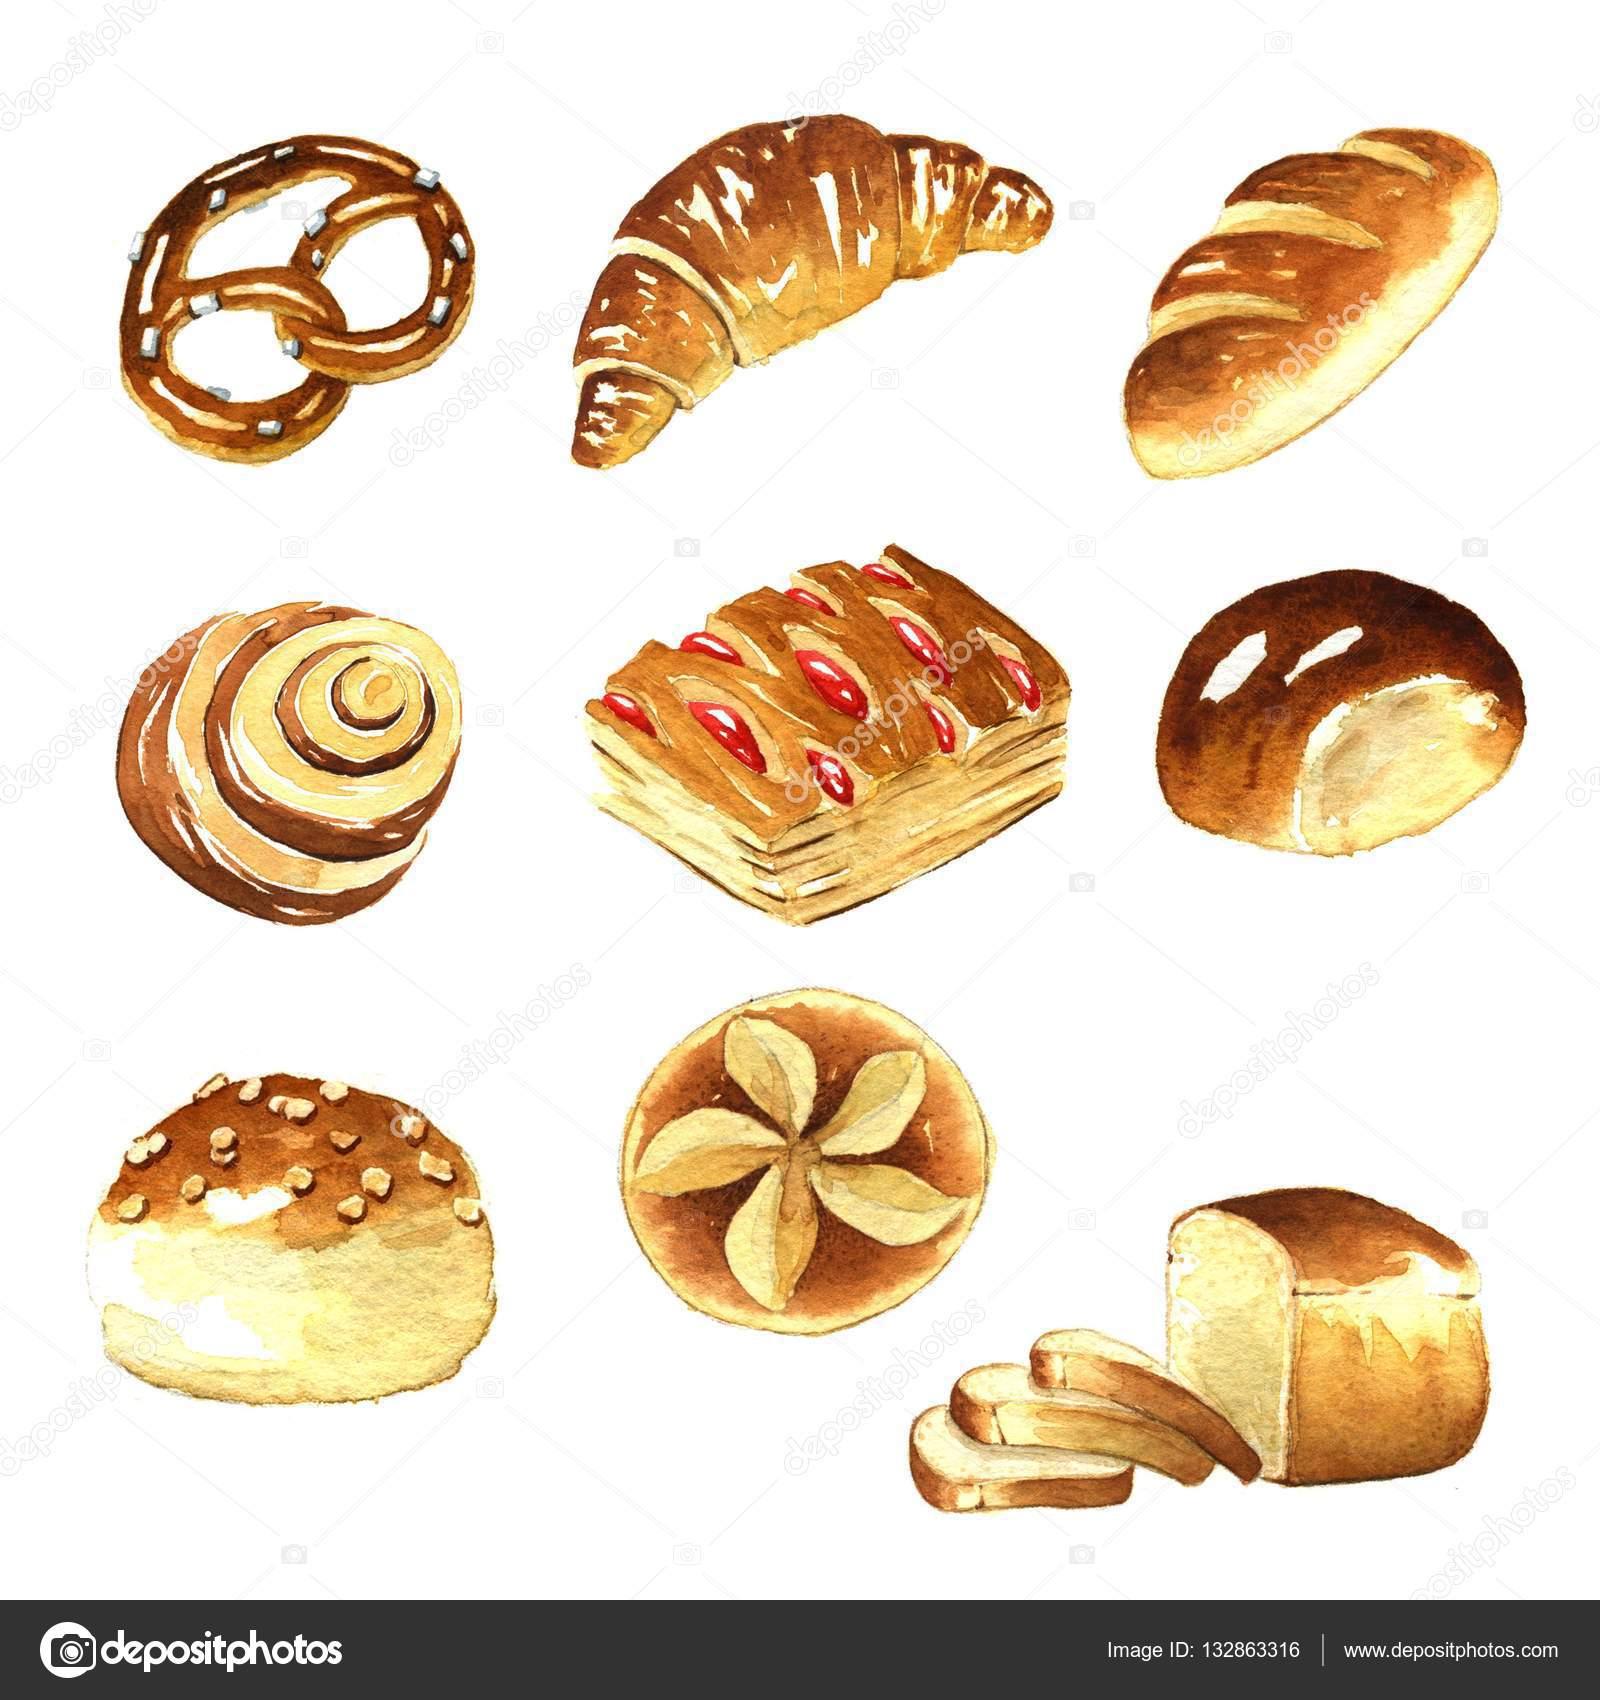 Rolls clipart baking bread Jara3000 Photo #132863316 Watercolor Stock